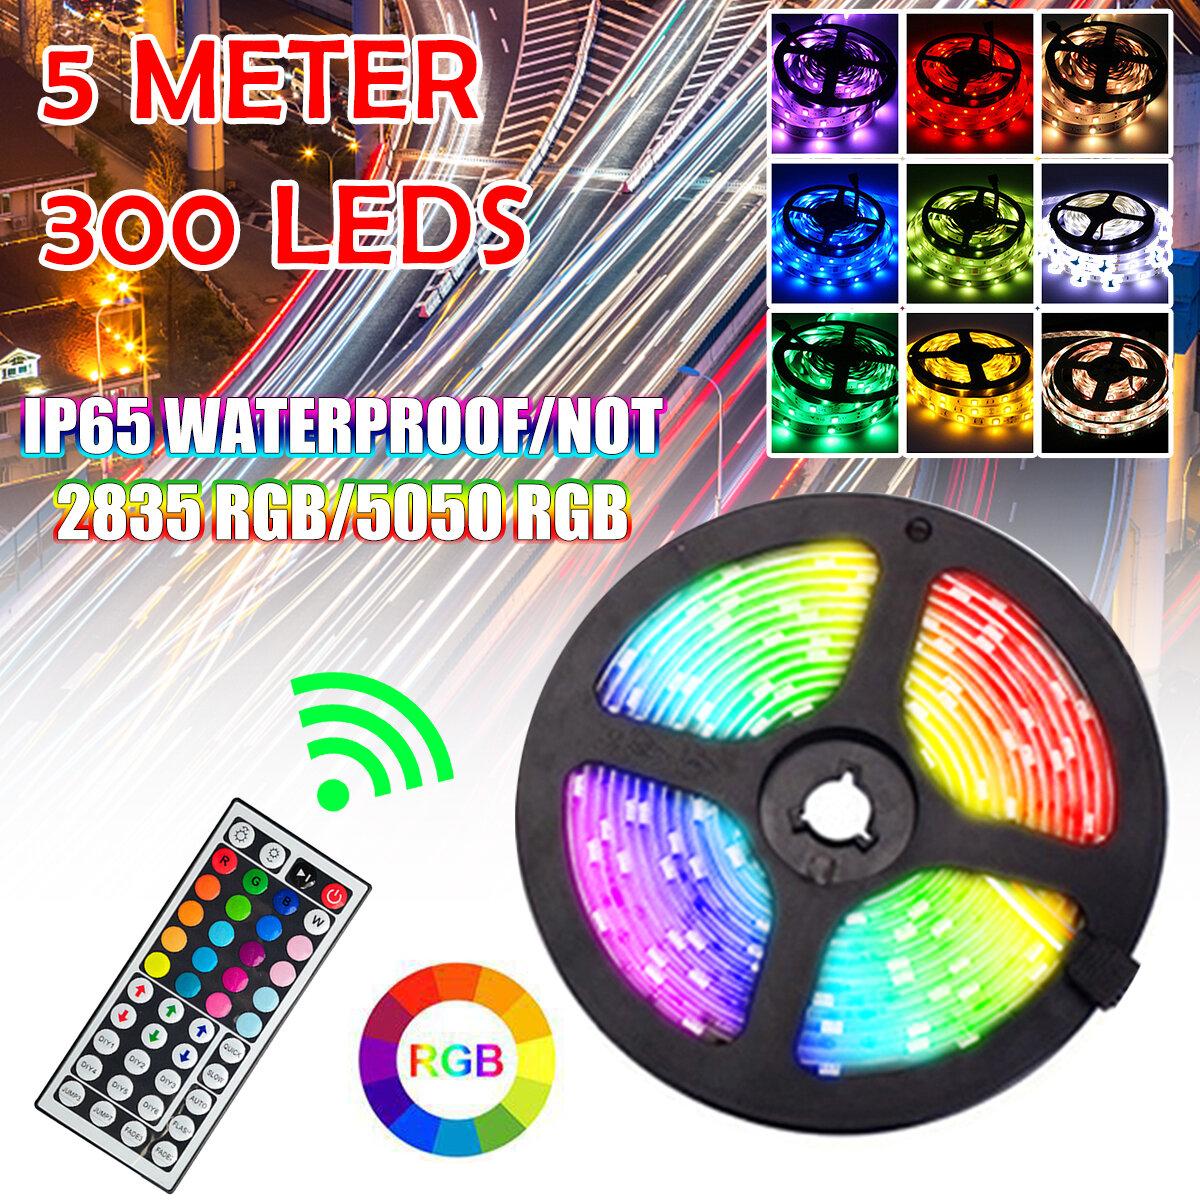 5M 2835/5050 Waterproof/Non-Waterproof RGB LED Strip Light + 44 Keys Remote Control + Power Adapter, Banggood  - buy with discount